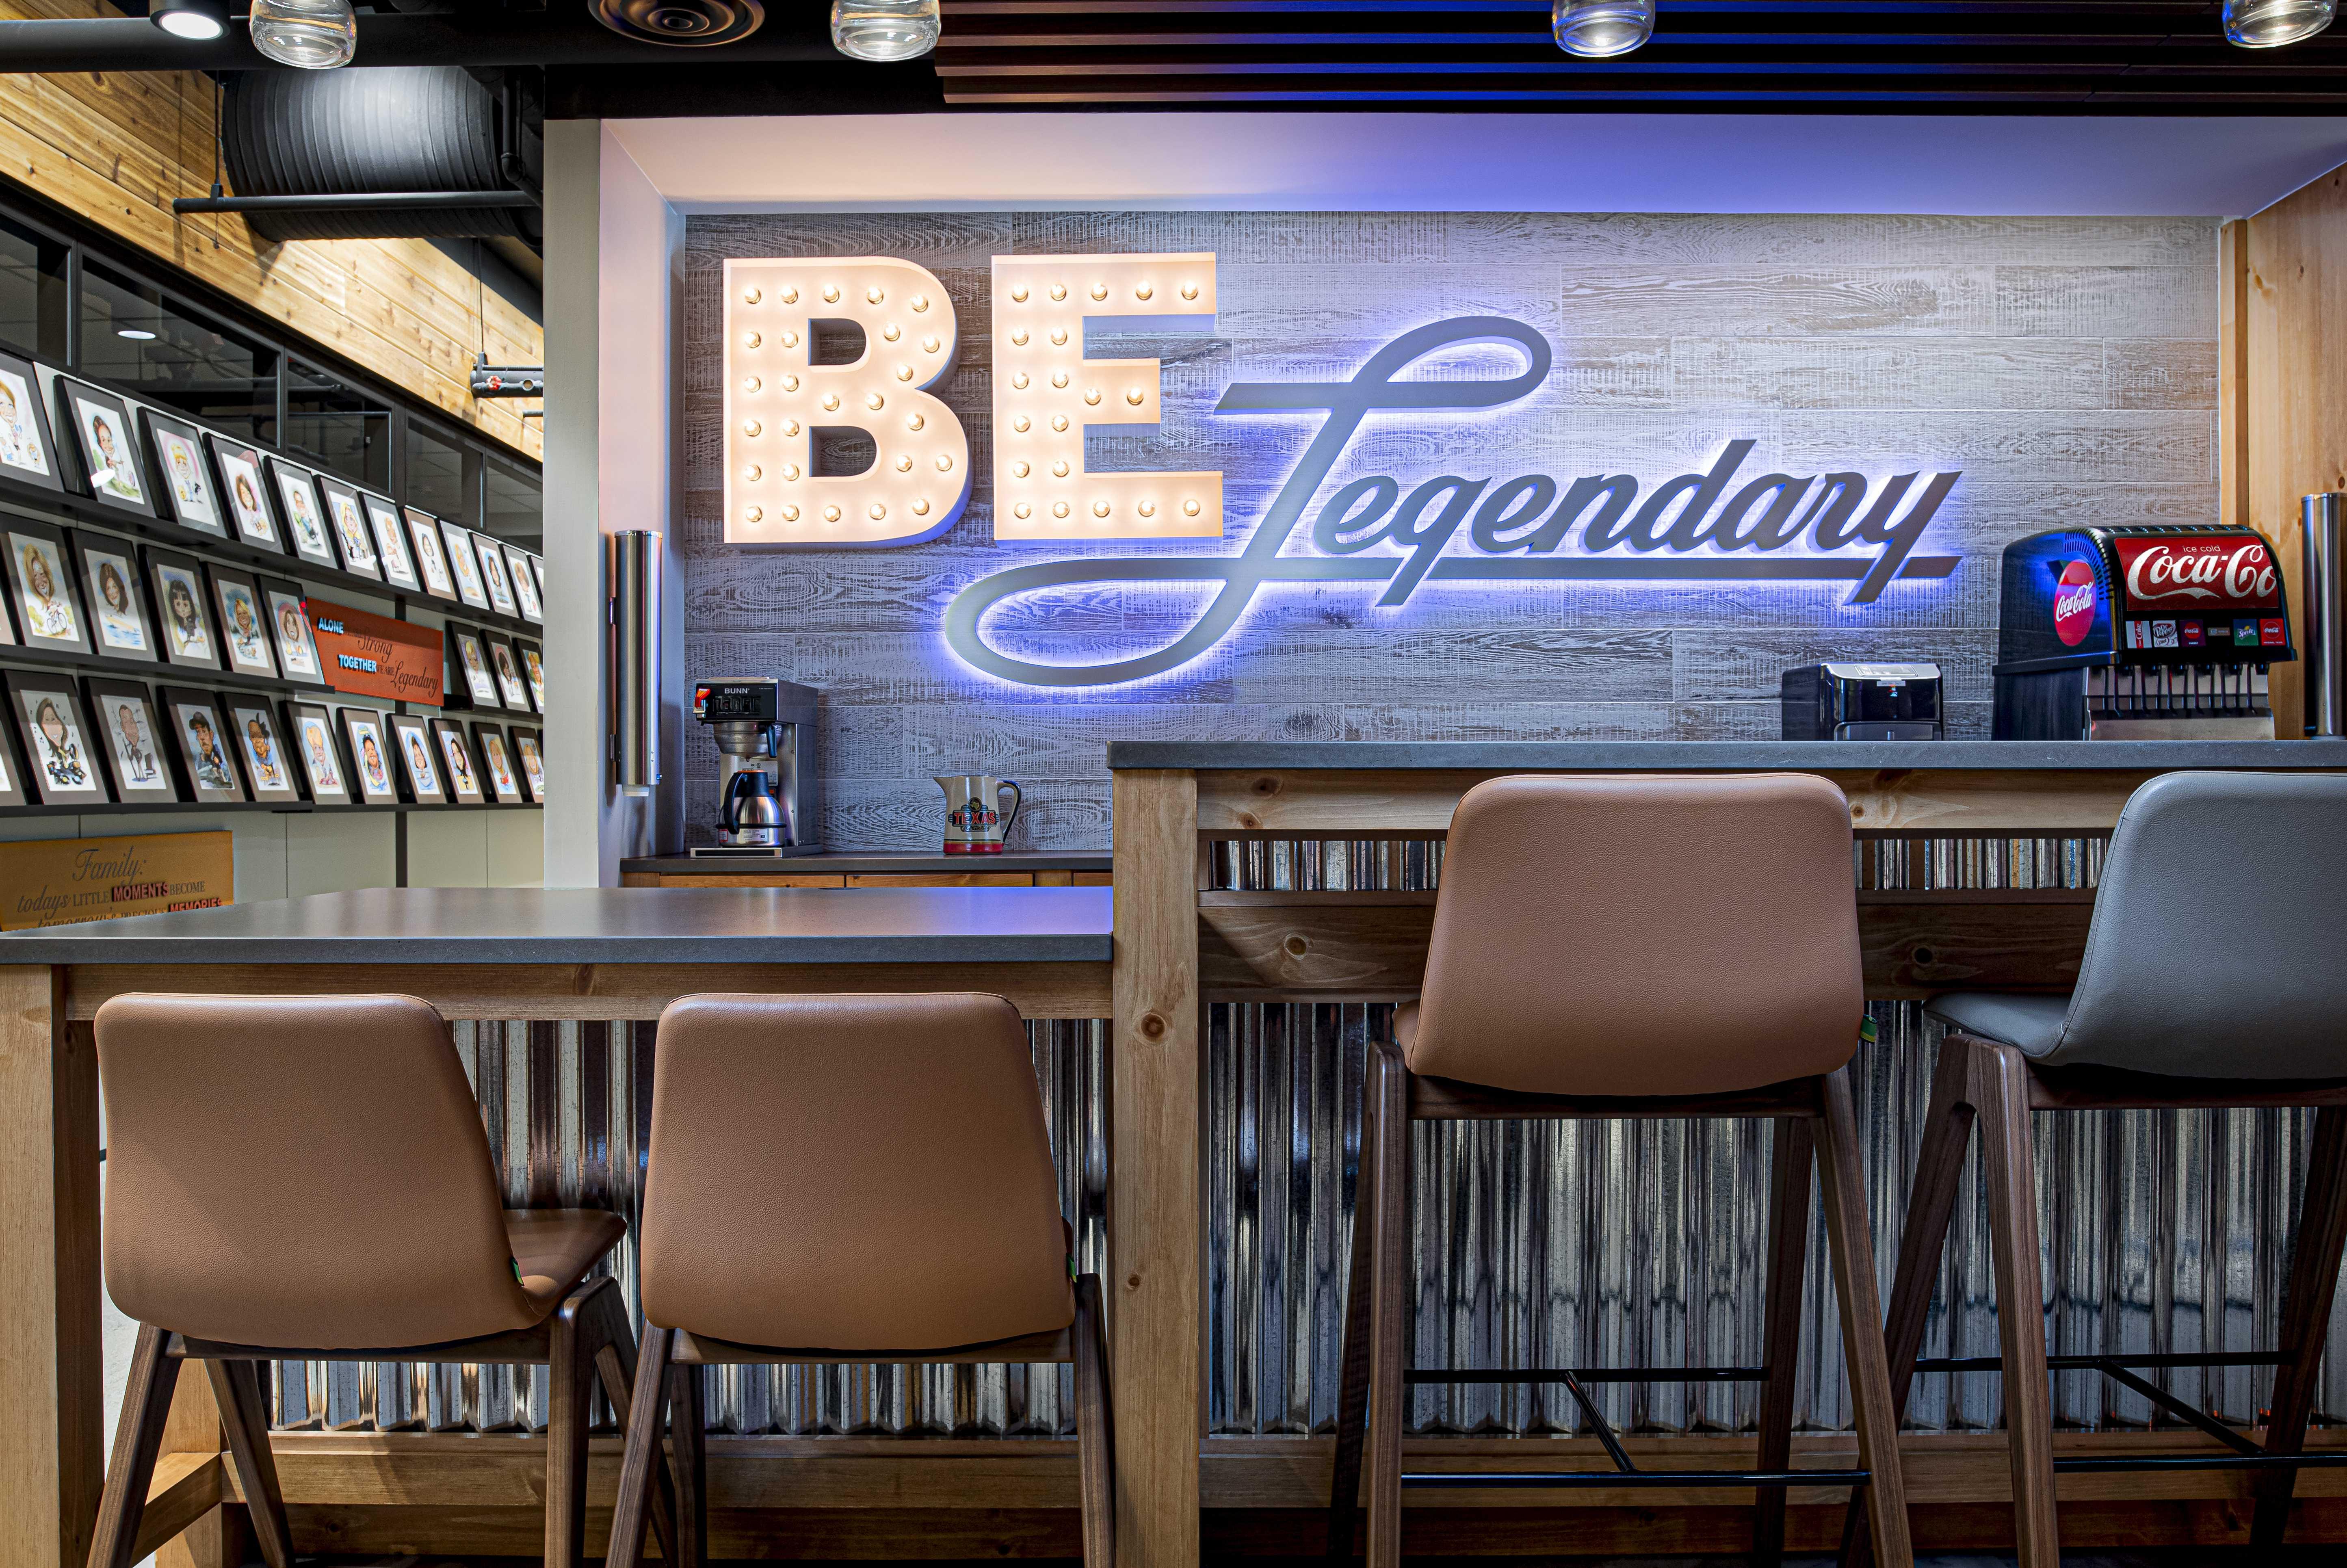 texas-roadhouse-office-be-legendary-bar